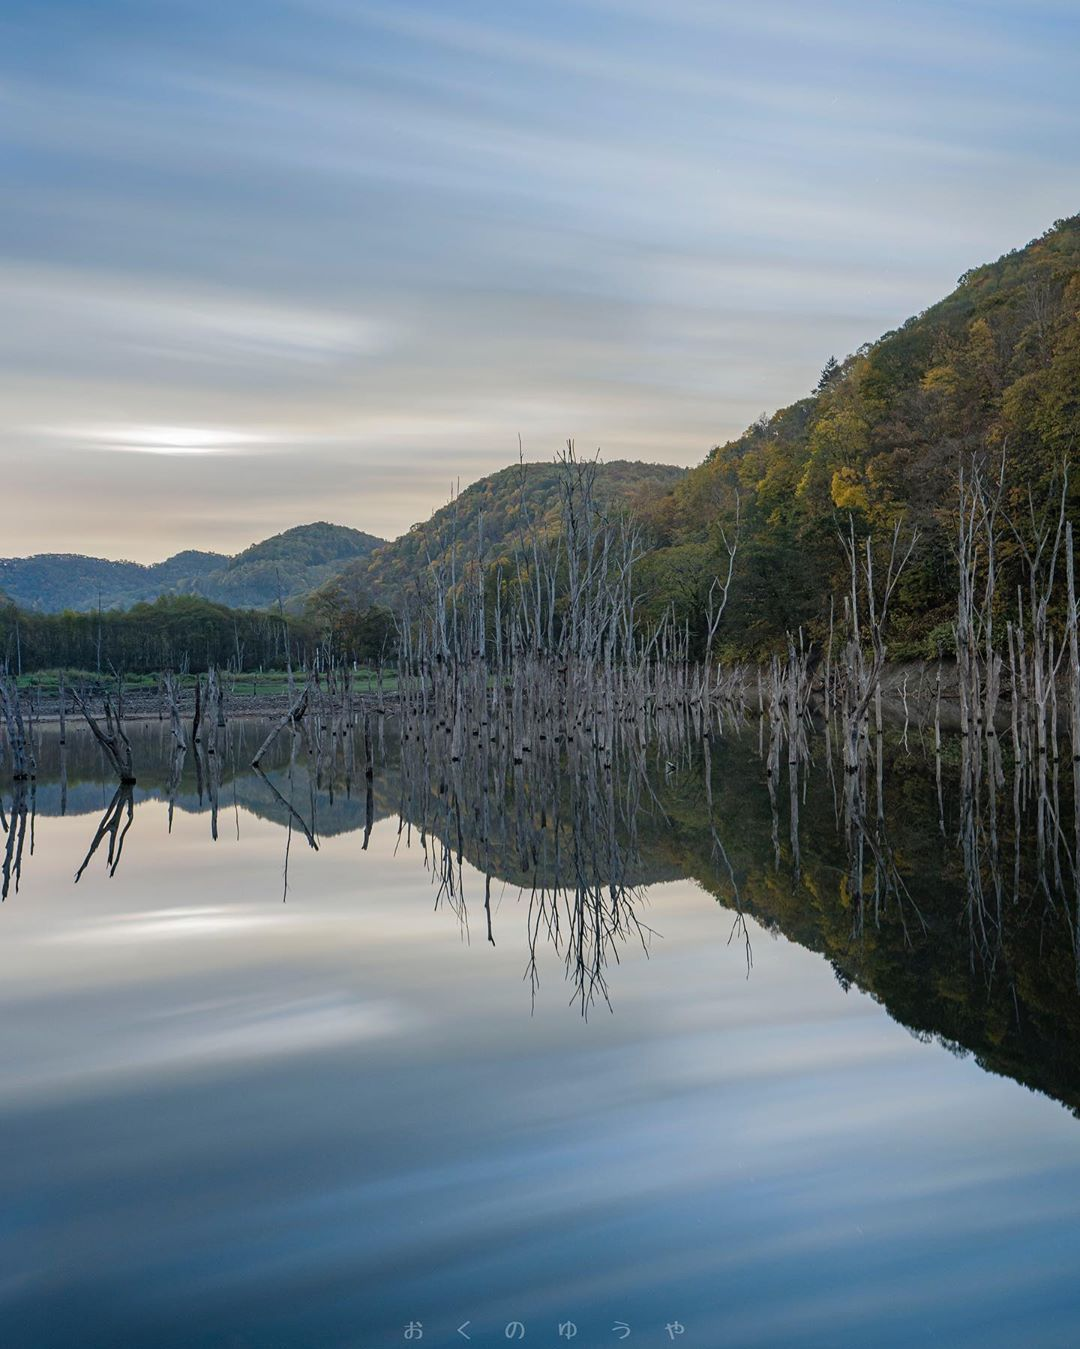 #japan #hokkaido  #hokkaidolikers  #japan_focus  #nature_brillance  #nature_special_  #addictedto_nature  #lovers_nippon  #jp_gallery  #ig_myshot  #ig_shotz  #ig_shotz_trees  #pixlib_jp  #pashadelic  #tu_natura  #japan_night_view  #japan_of_insta  #instagramjapan  #visitshiribeshi  #tokyocameraclub  #special_spot_  #love_bestjapan  #art_of_japan_  #北海道 #赤井川 #ファインダー越しの私の世界  #東京カメラ部 #japan_of_insta #japan #hokkaido  #hokkaidolikers  #japan_focus  #